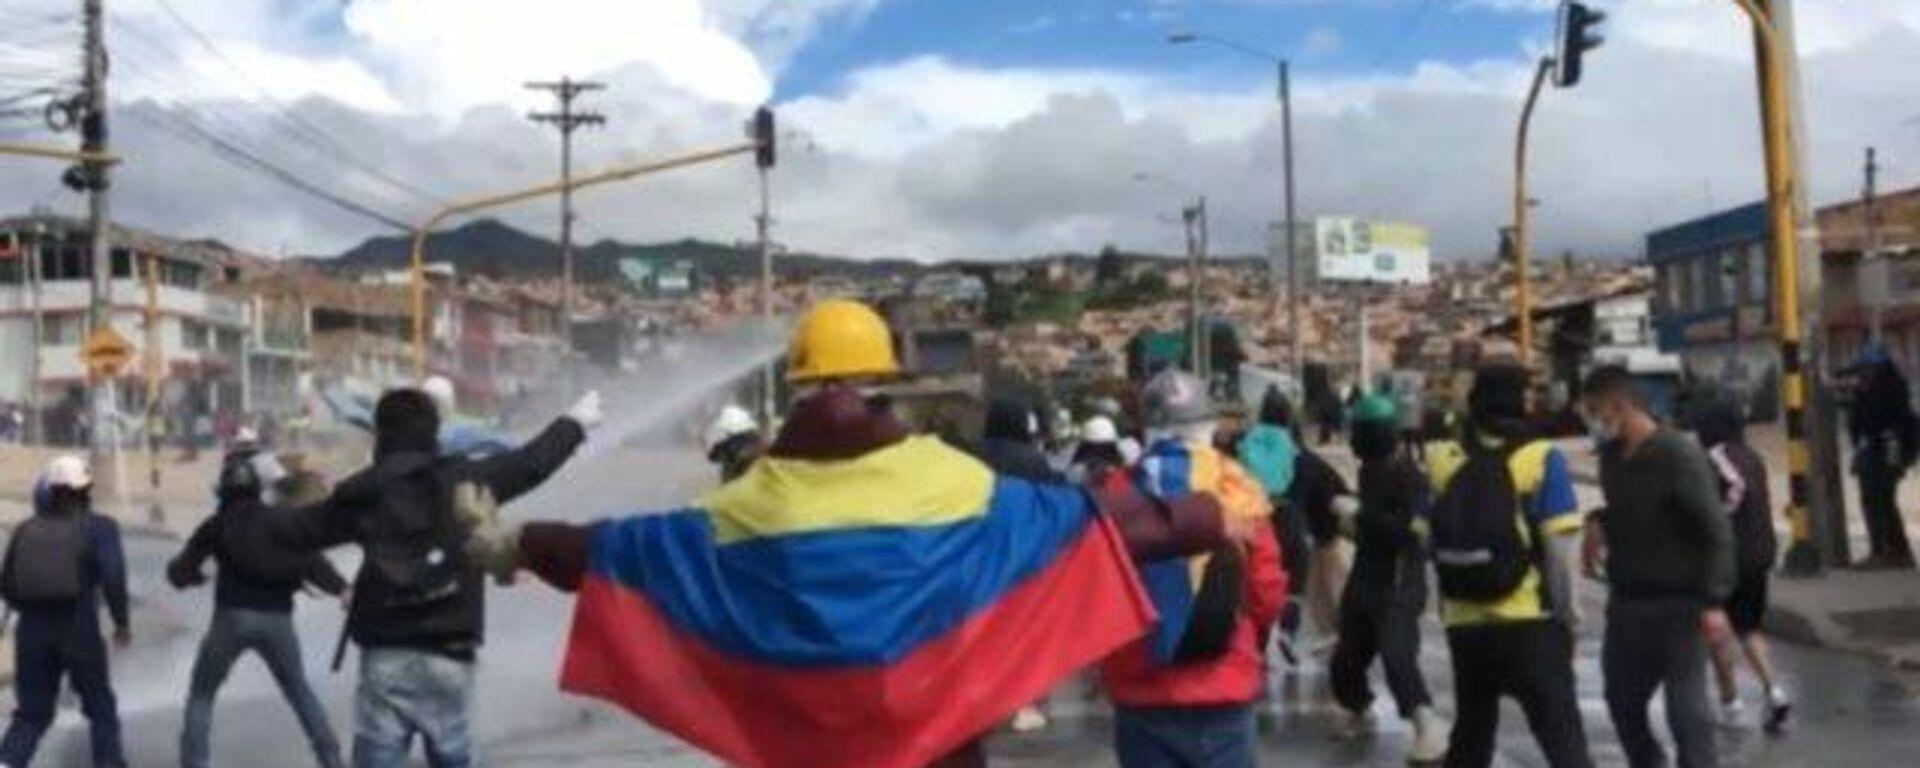 Los manifestantes se enfrentan con la Policía en Bogotá - Sputnik Mundo, 1920, 29.07.2021